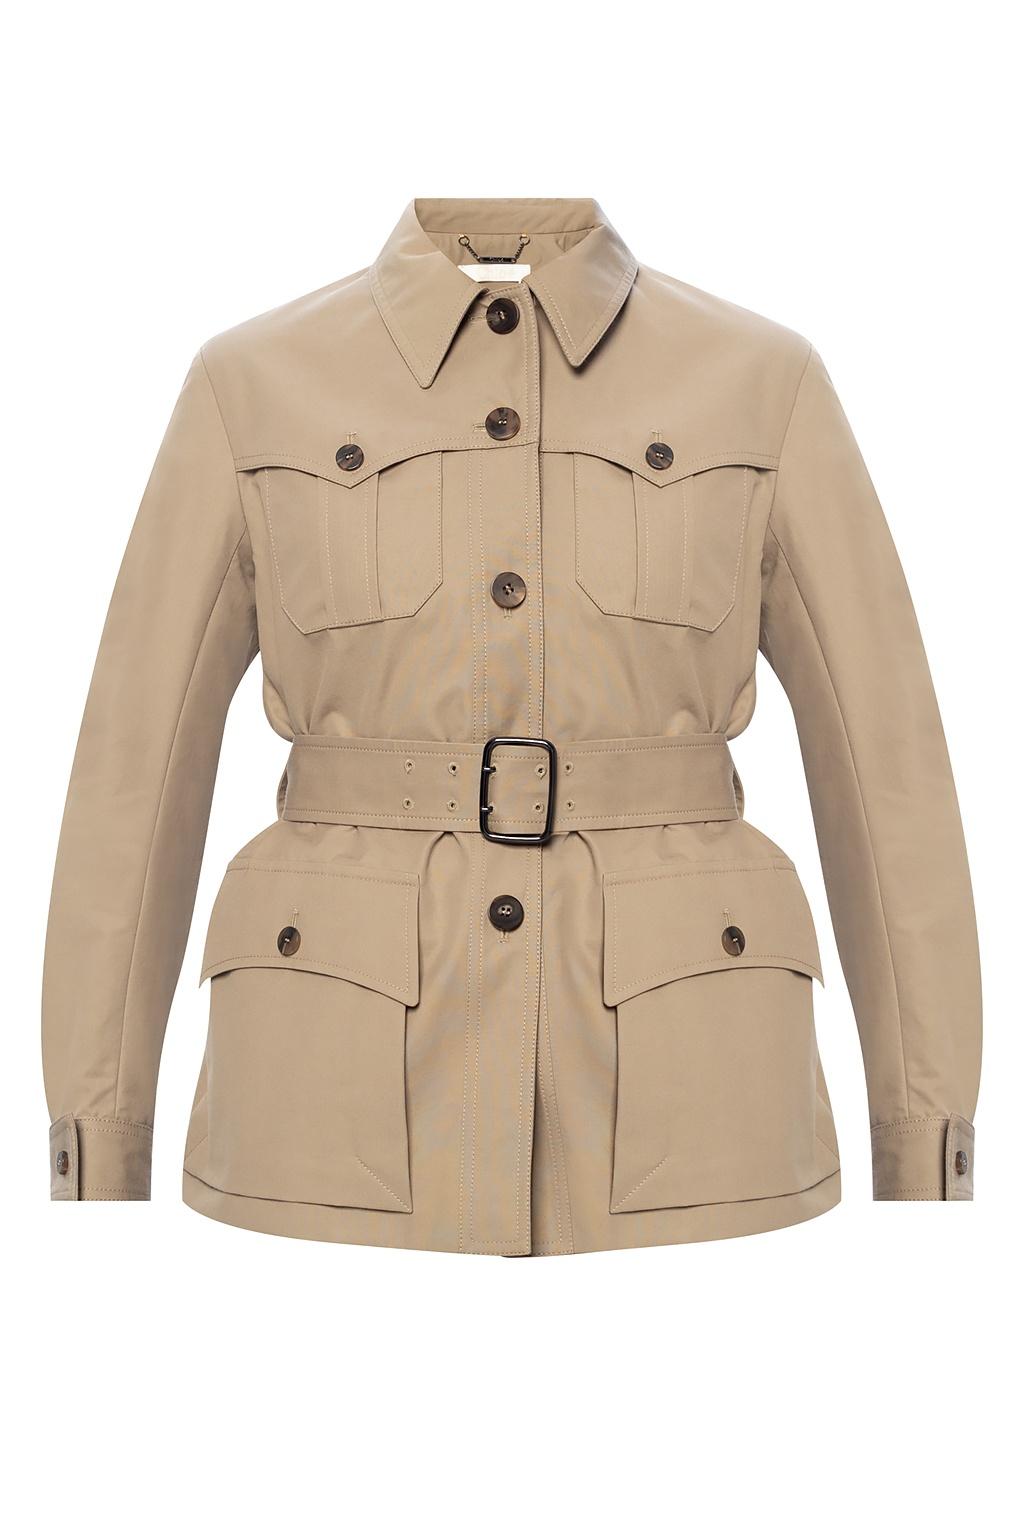 Chloé Belted jacket